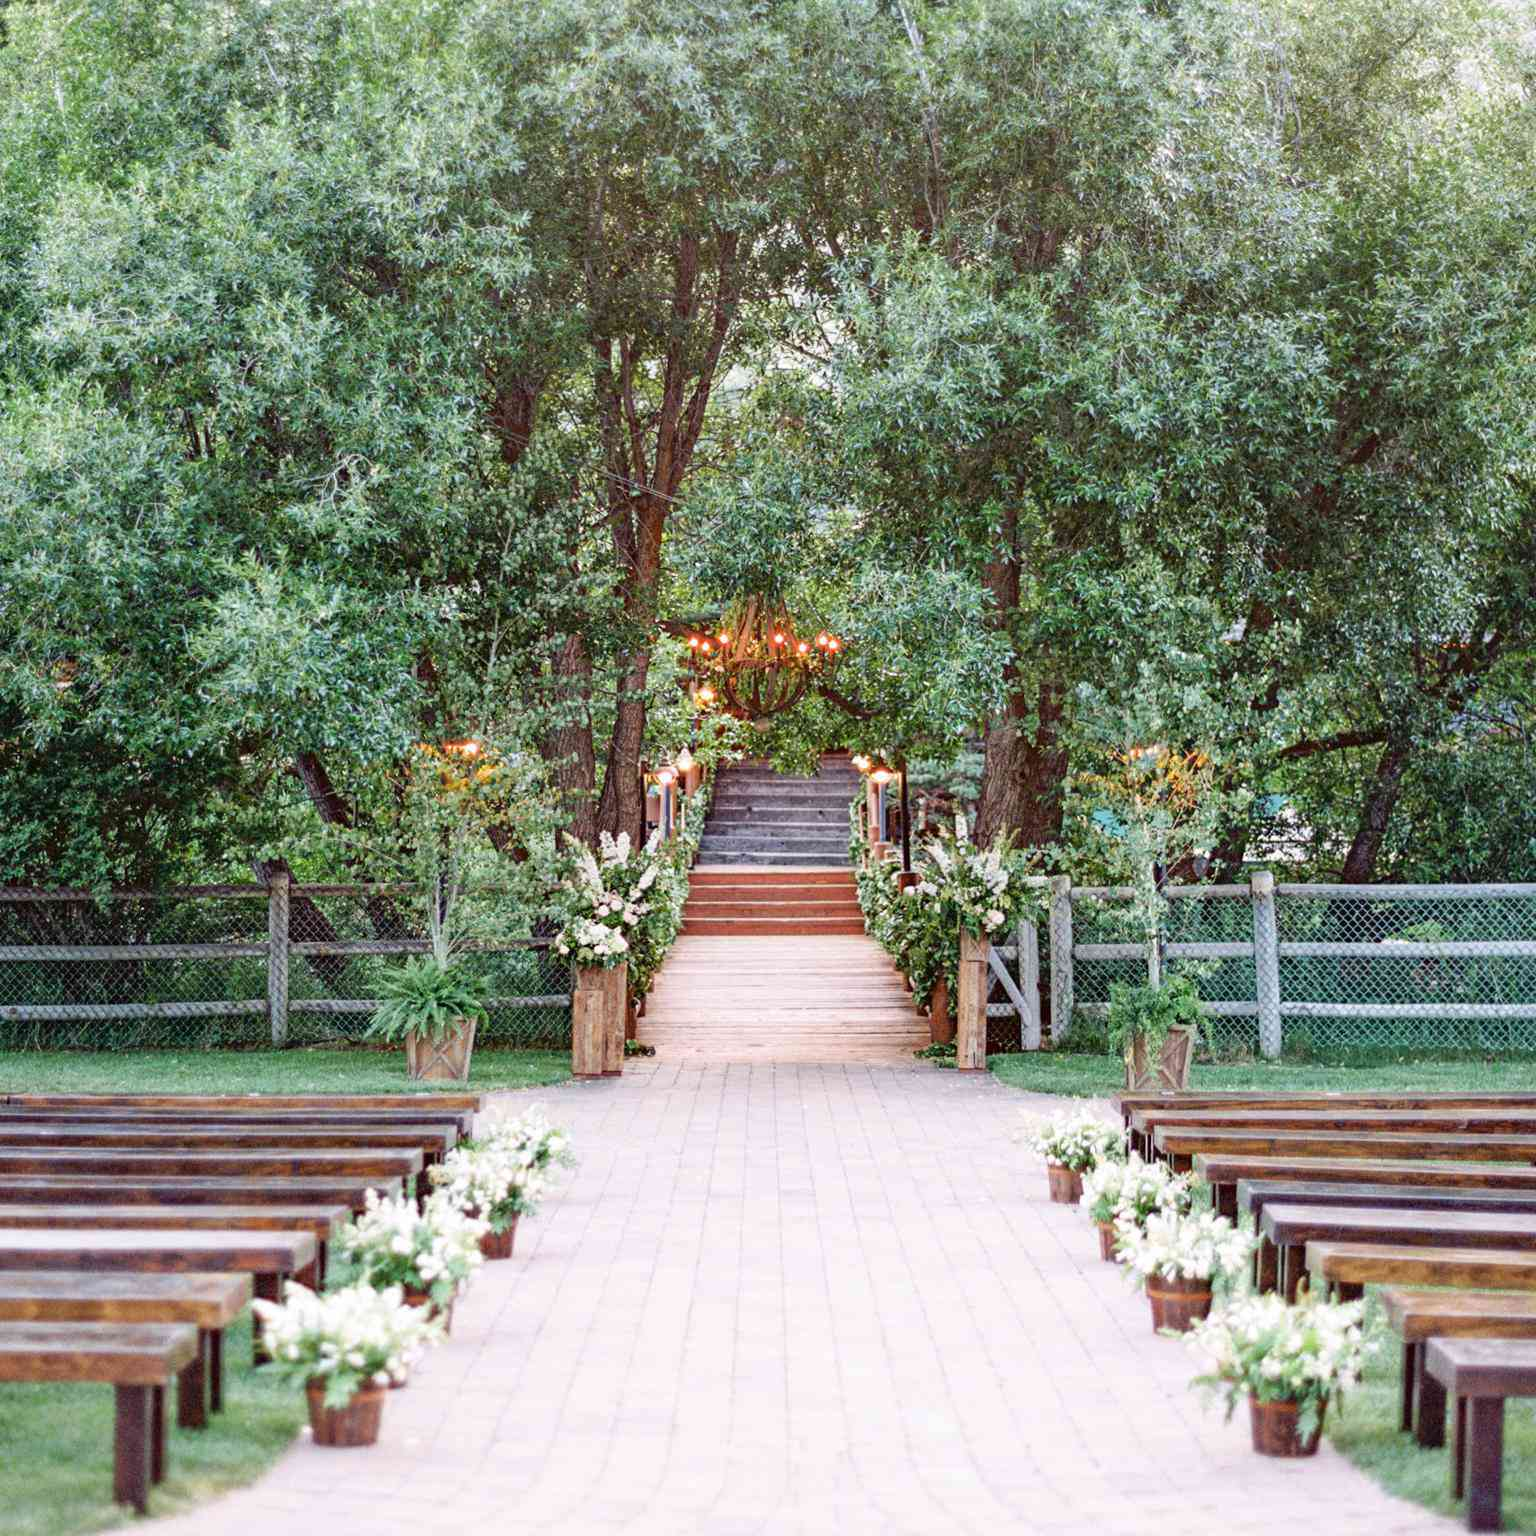 10 Casual Wedding Ideas For A Laid Back Affair